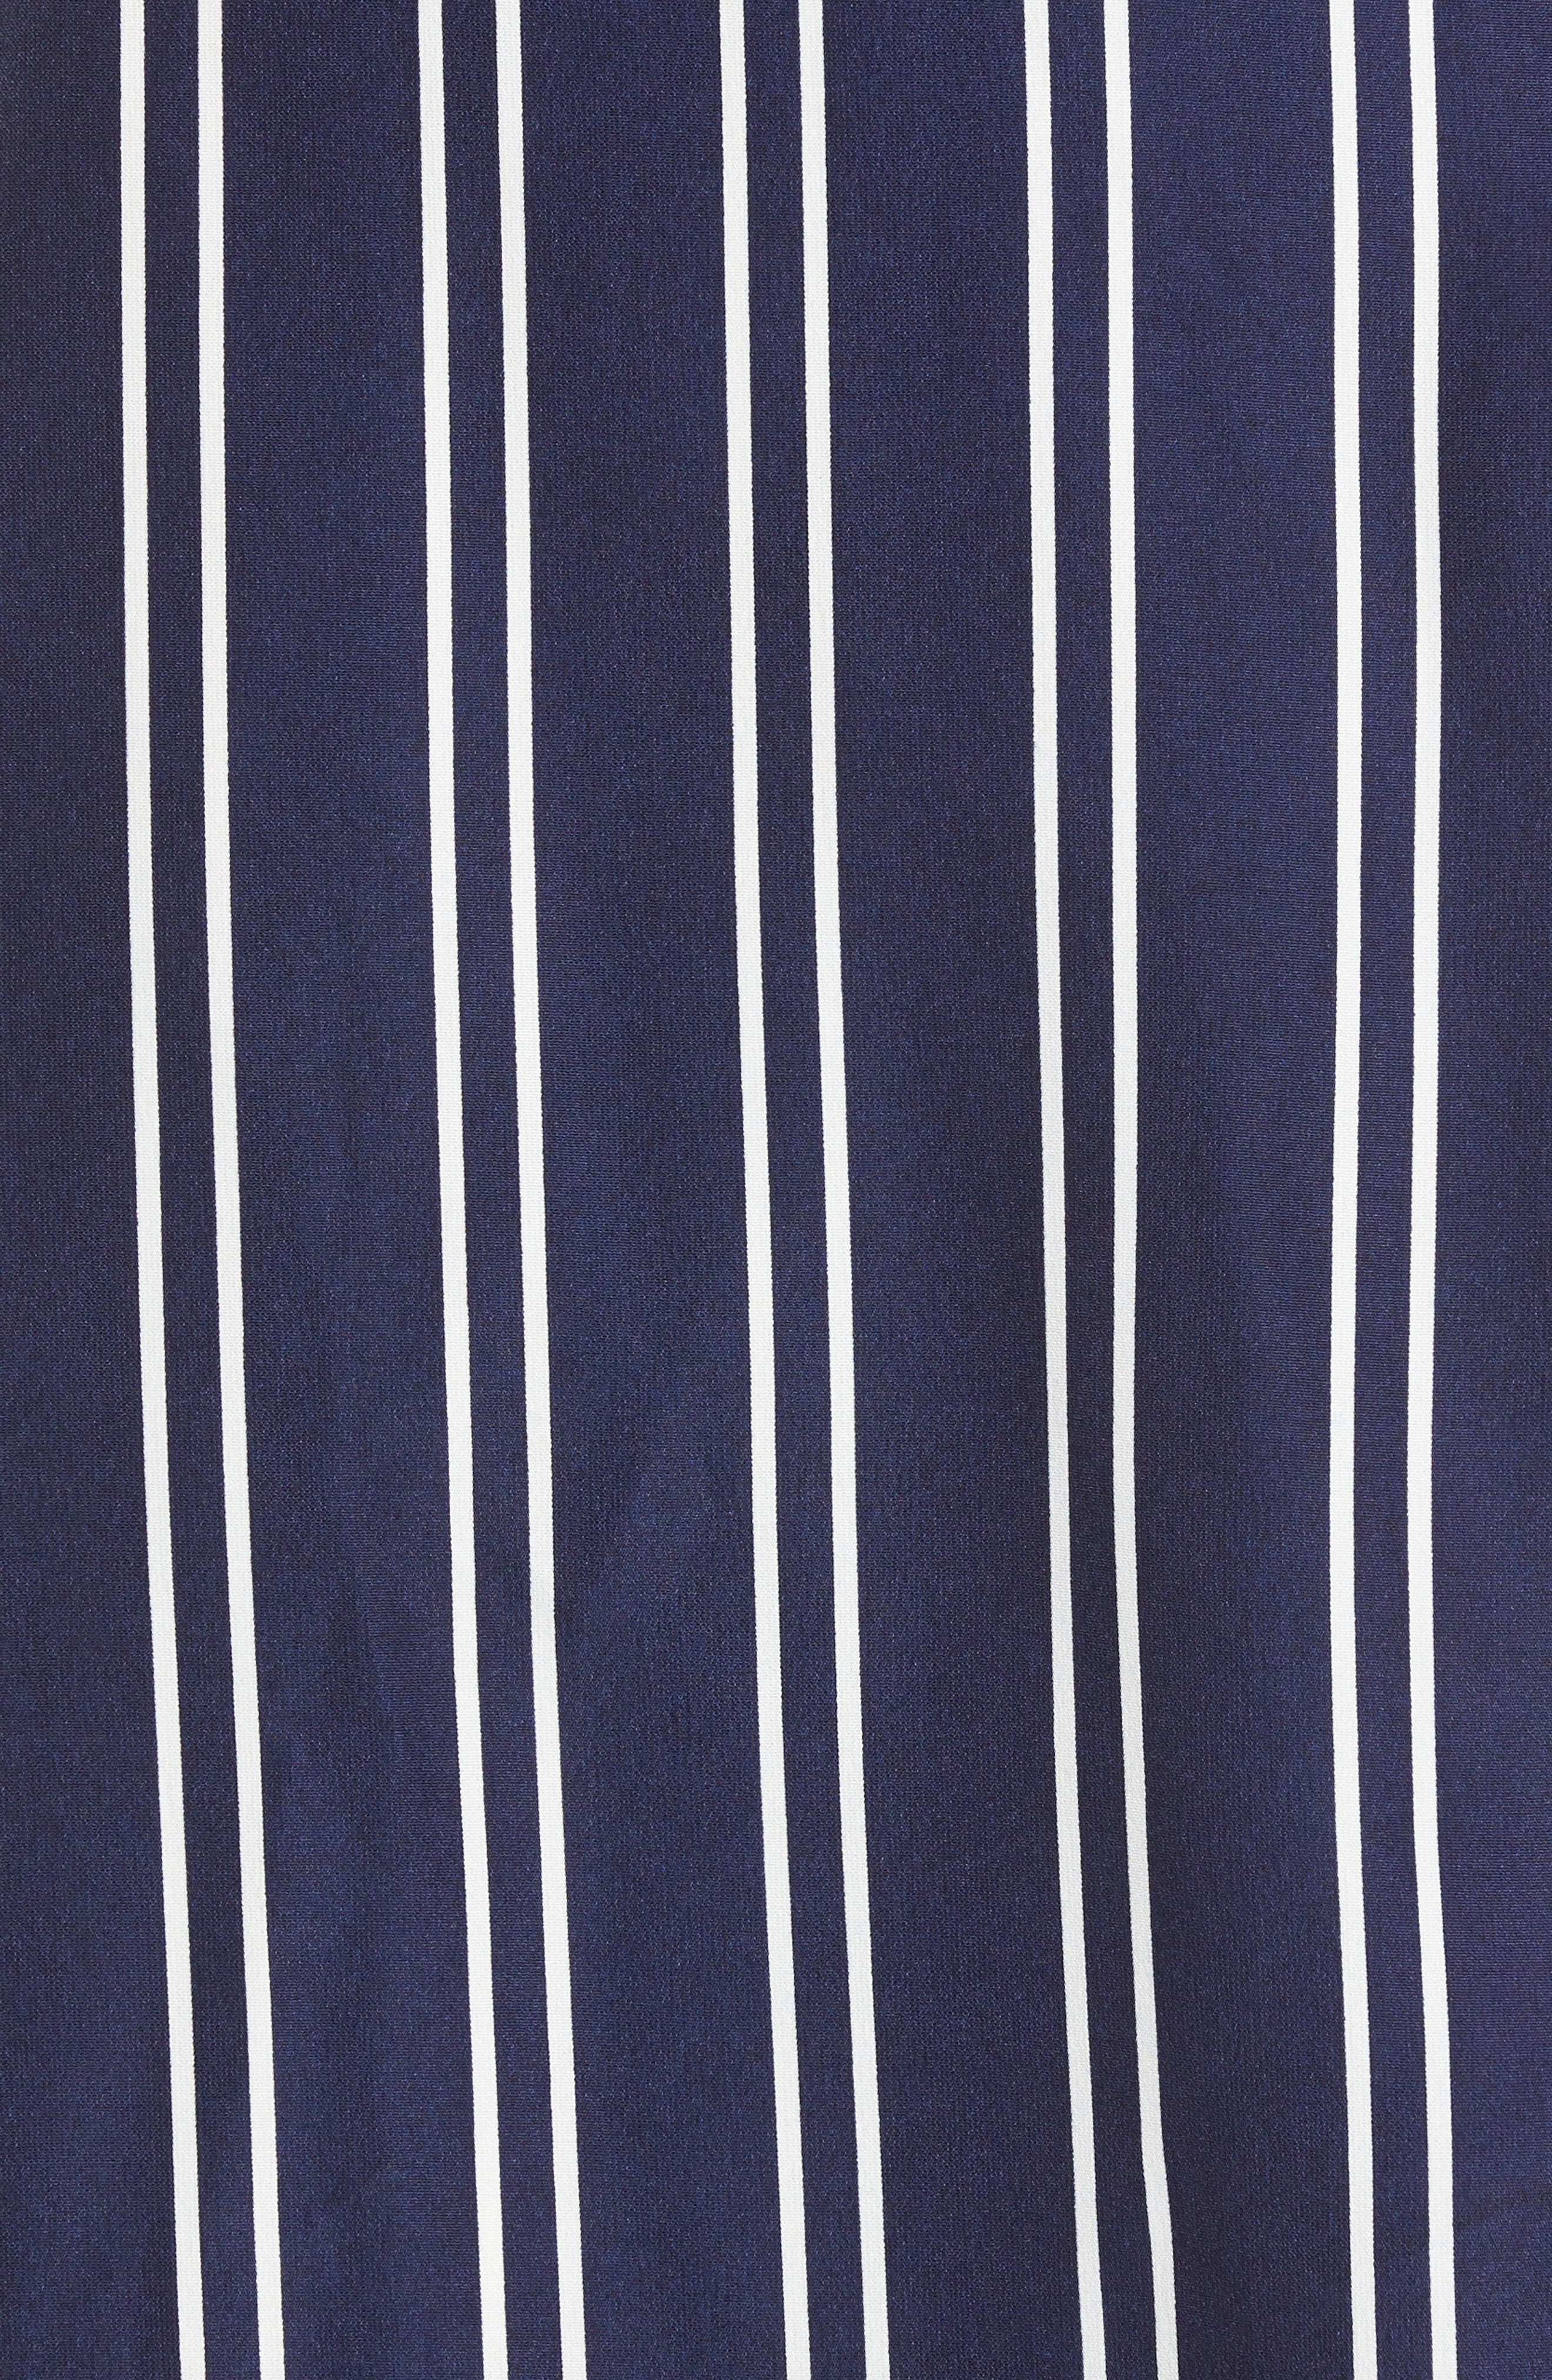 Stripe Wrap Midi Dress,                             Alternate thumbnail 5, color,